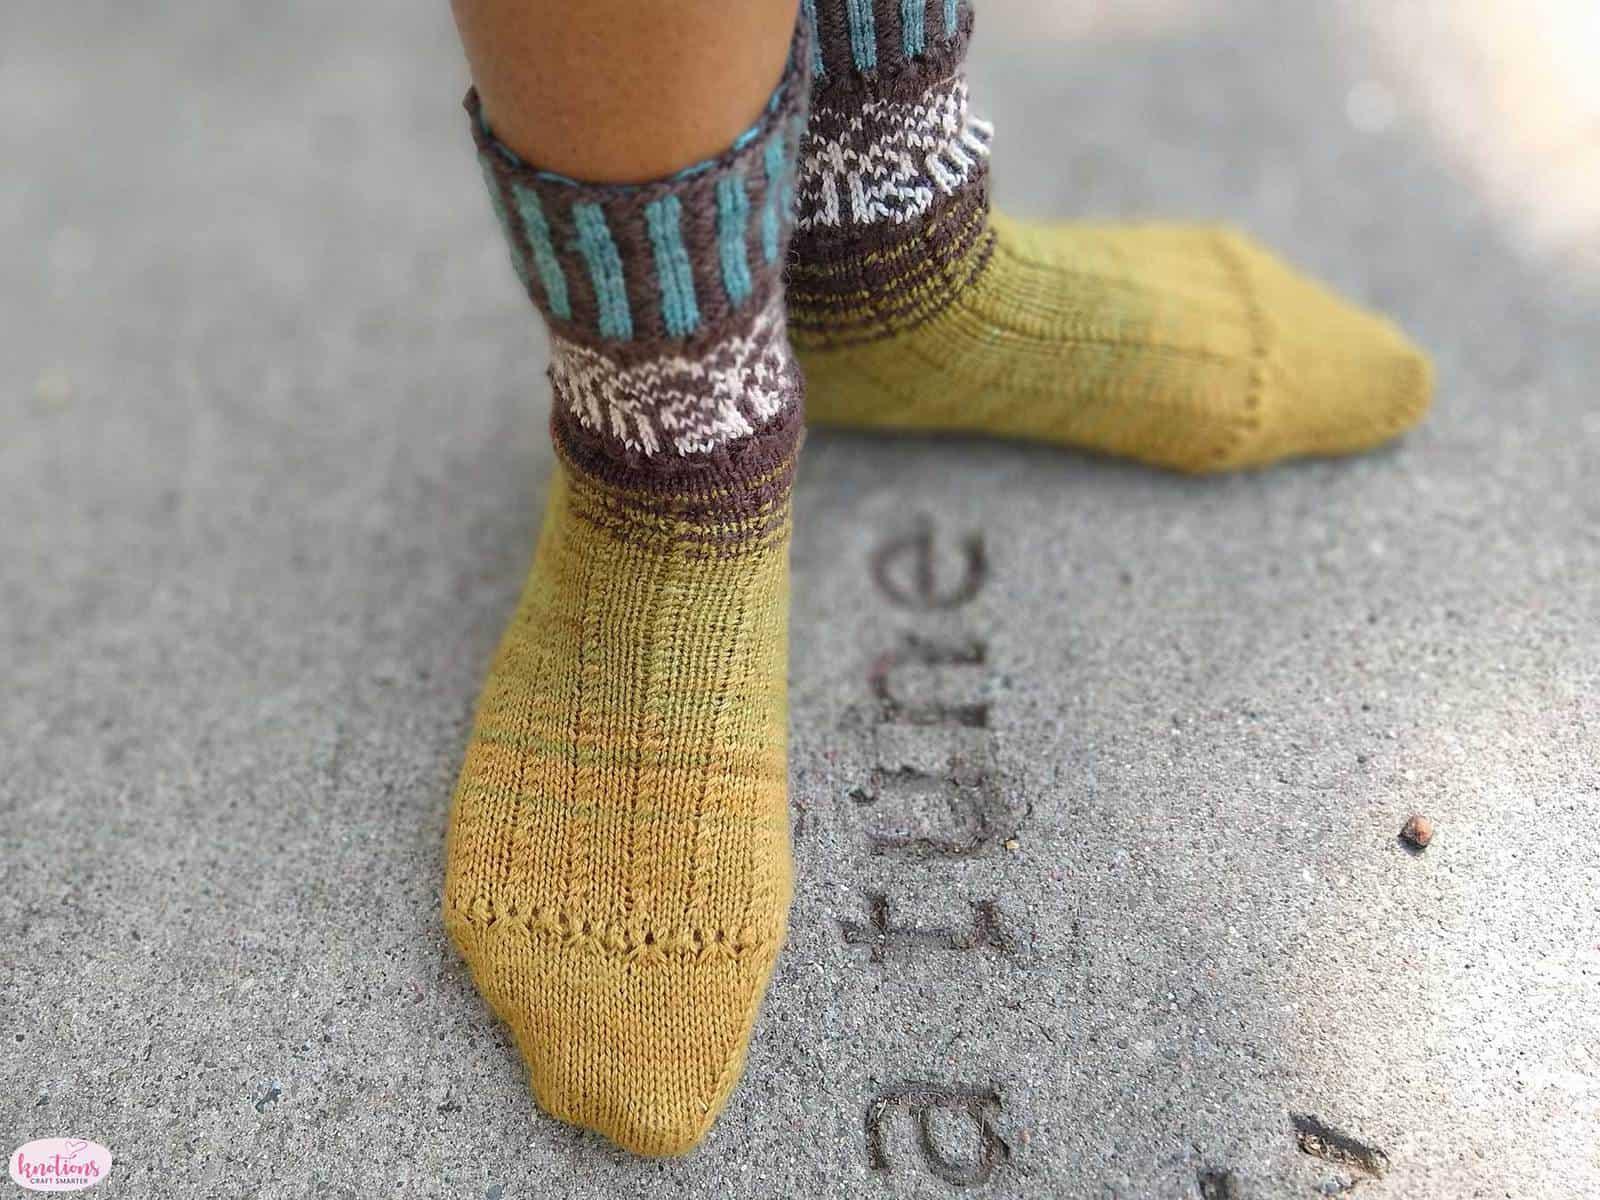 carved-wood-socks-11